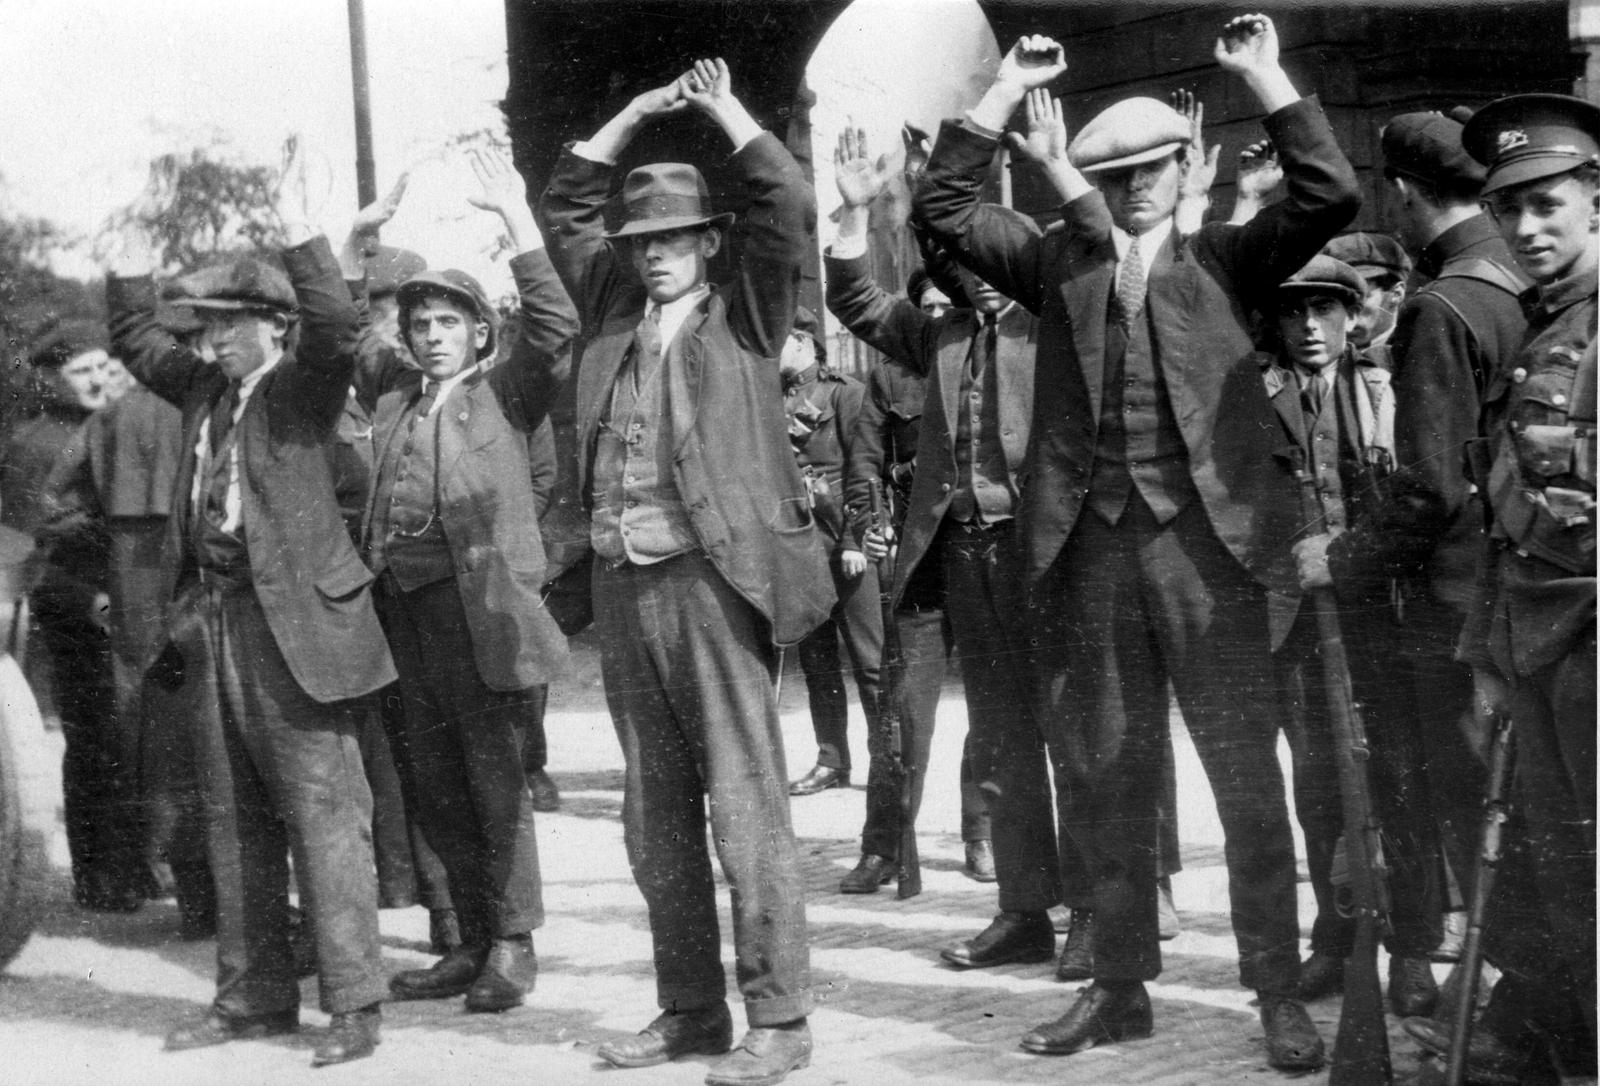 Image - IRA Volunteers captured after the burning. Credit: Spaarnestad Photo